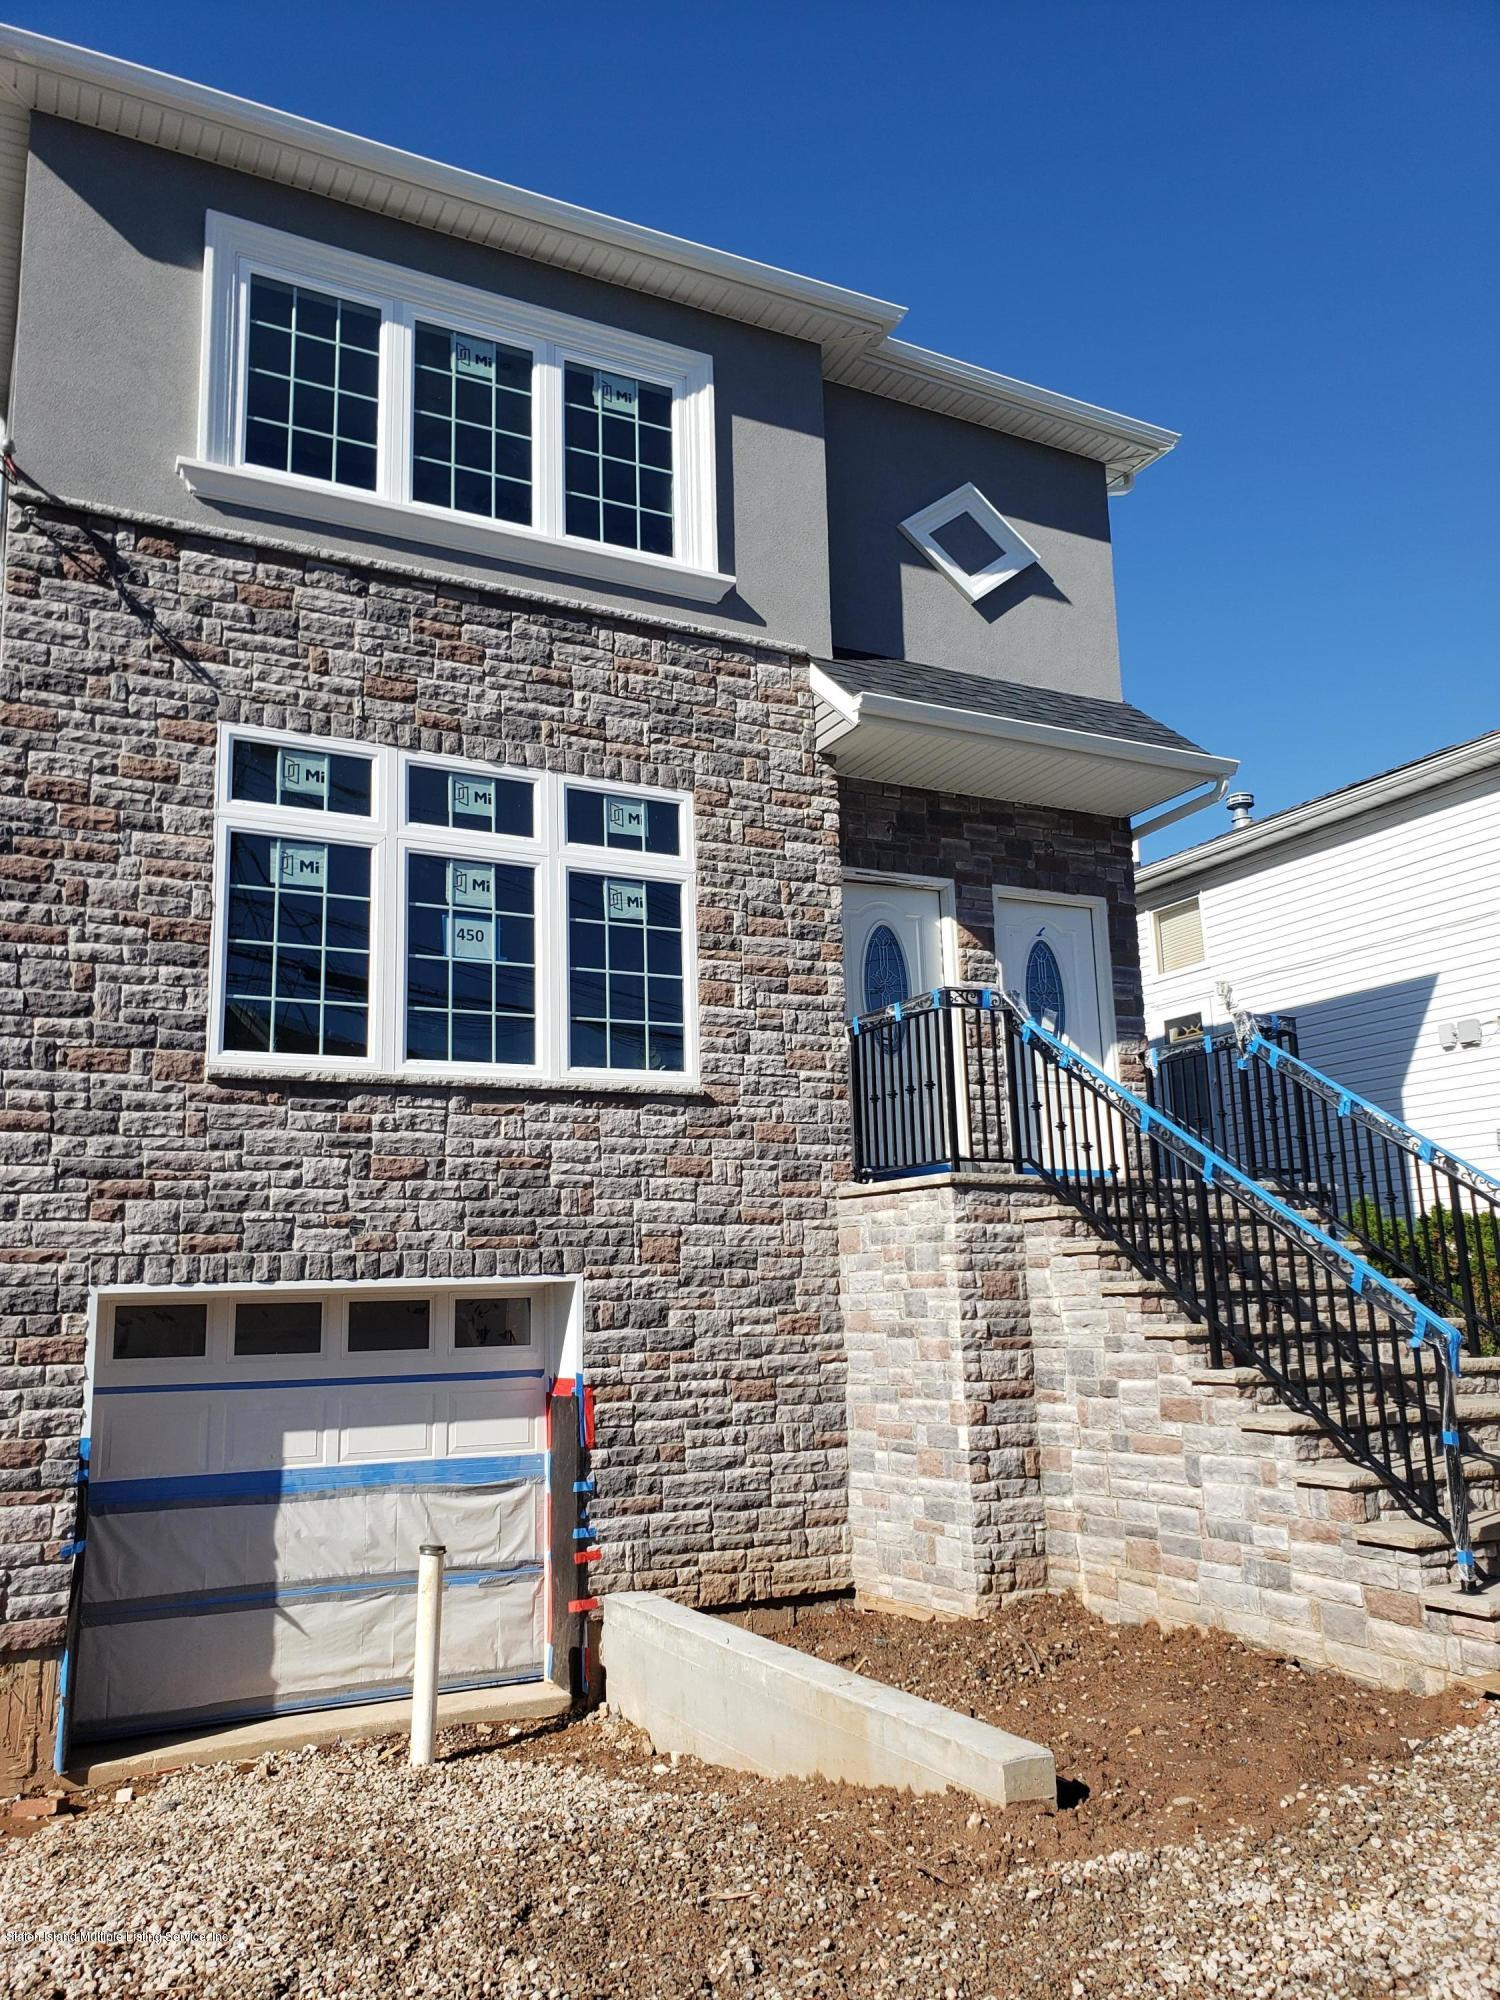 Two Family - Detached 450 Eltingville Boulevard  Staten Island, NY 10312, MLS-1141103-2